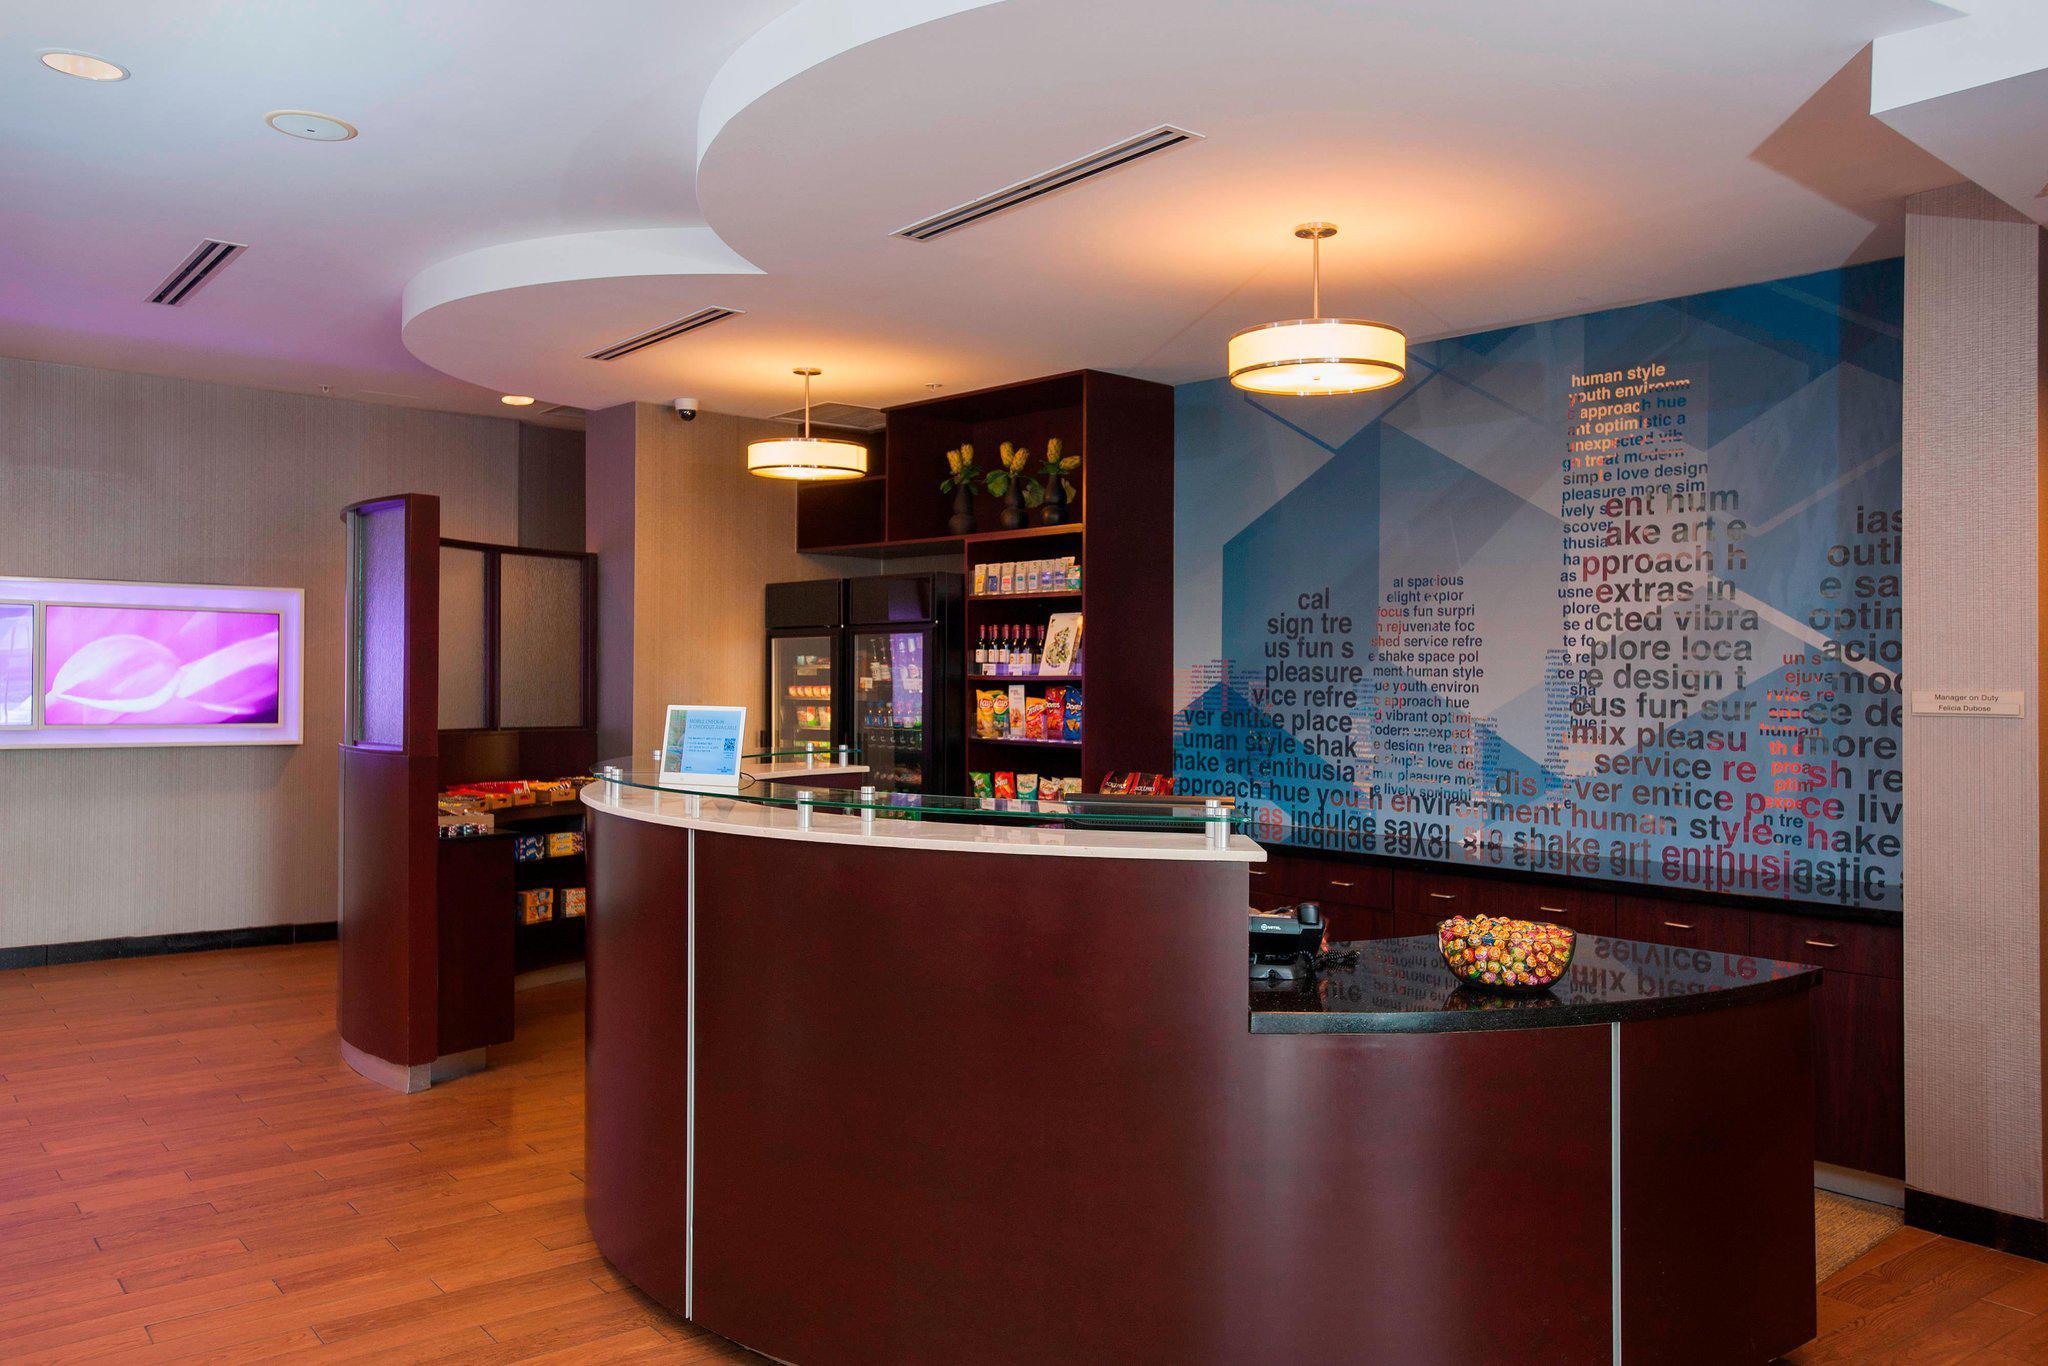 SpringHill Suites by Marriott Birmingham Colonnade/Grandview